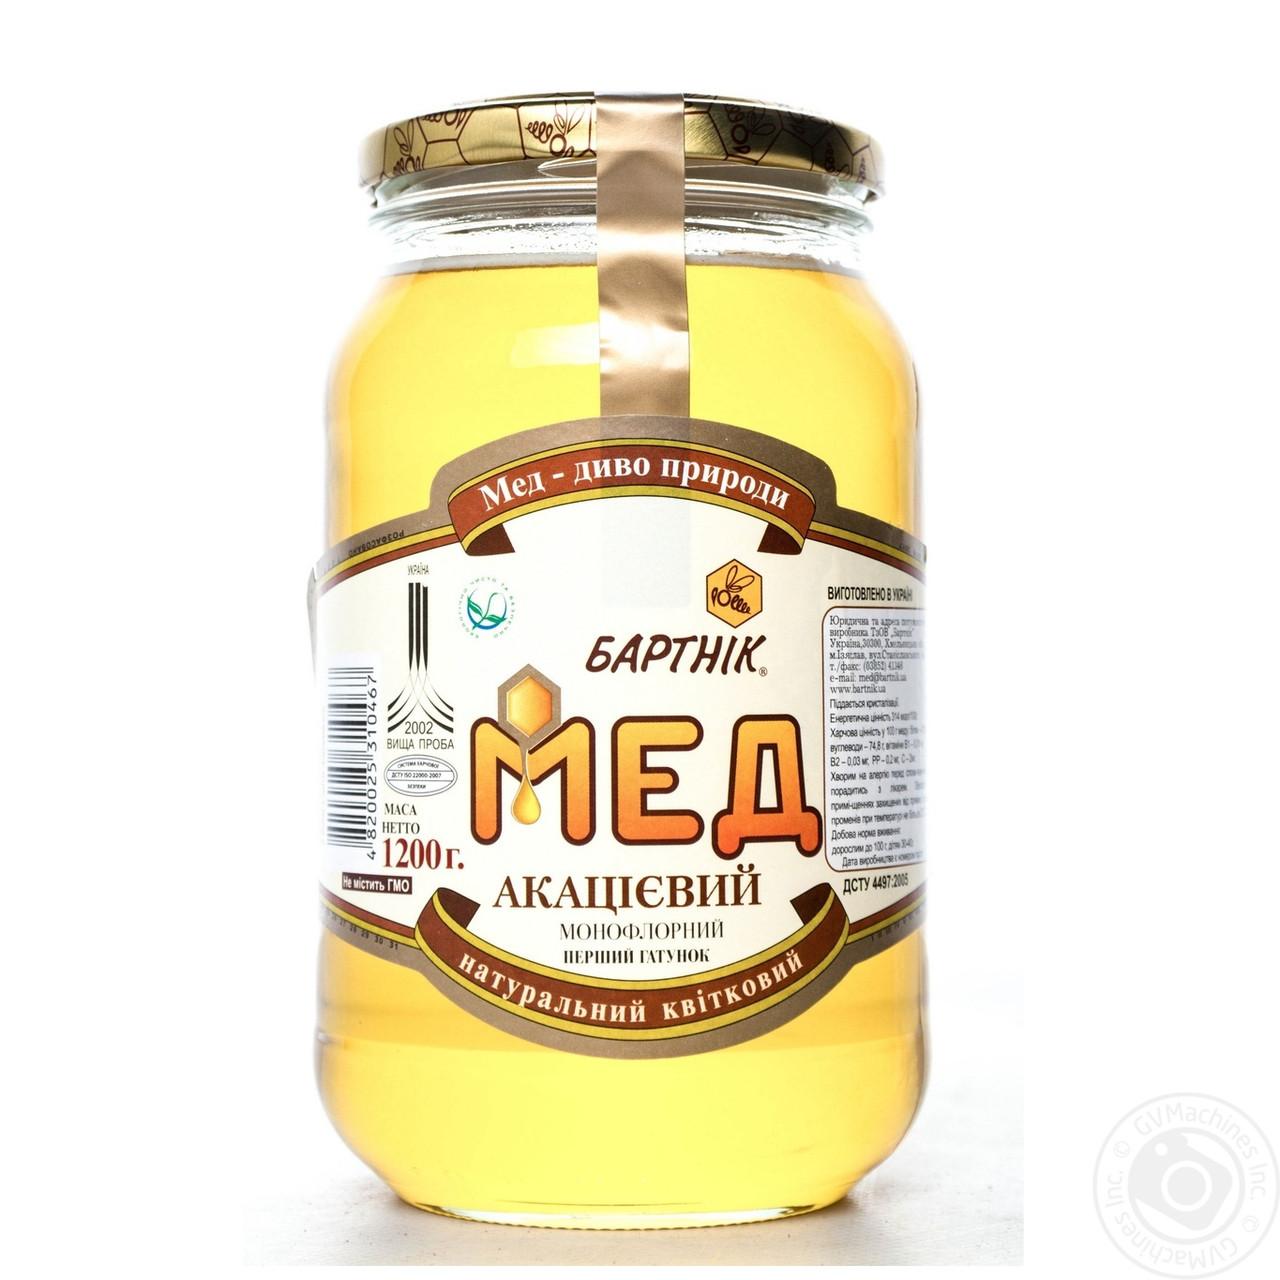 Мед бартник акациевый натуральный 1200г